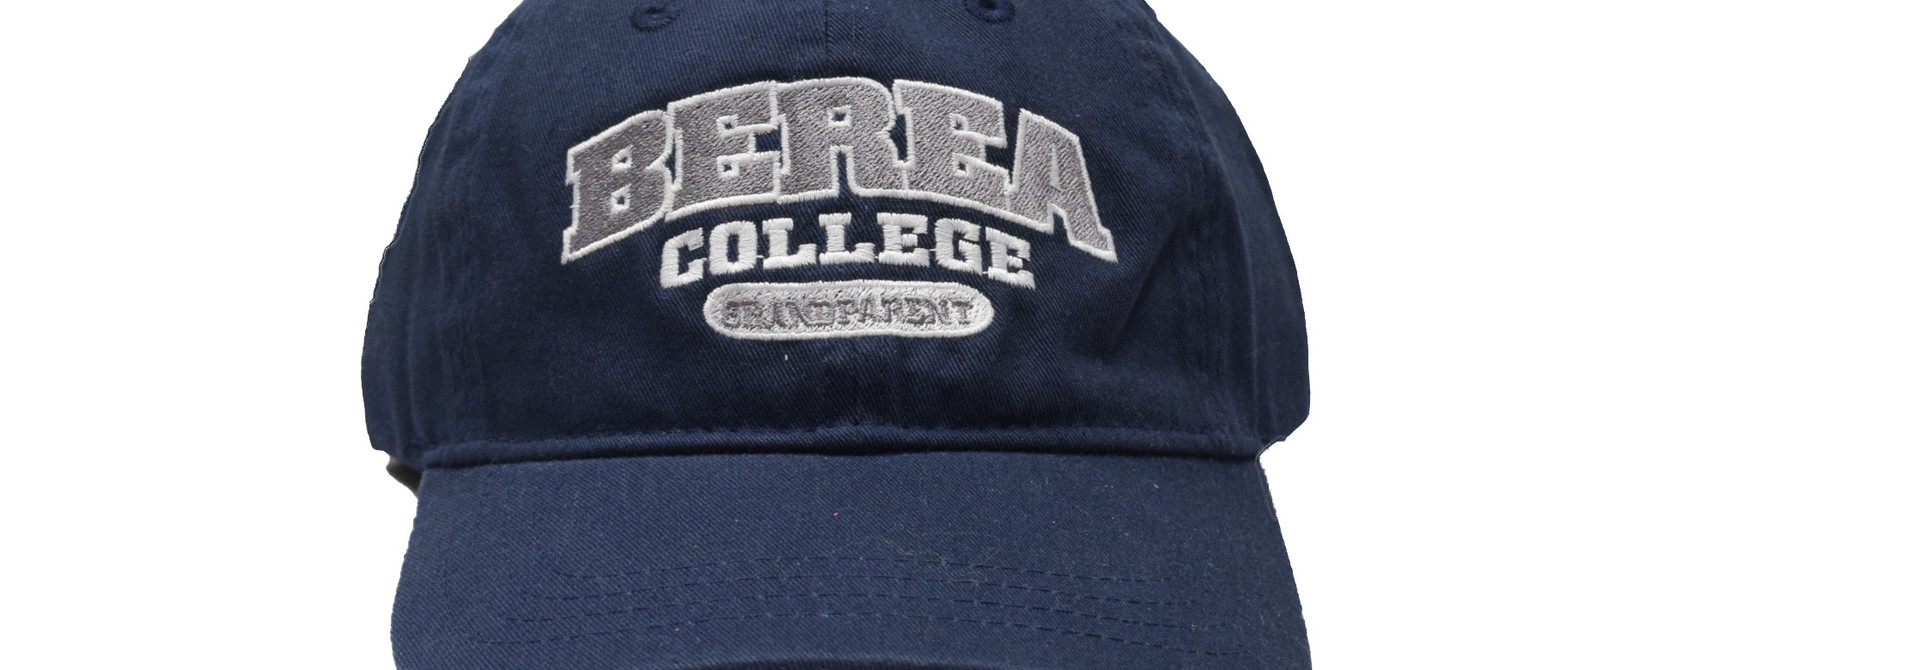 Navy Berea College Grandparent Ball Cap Strap